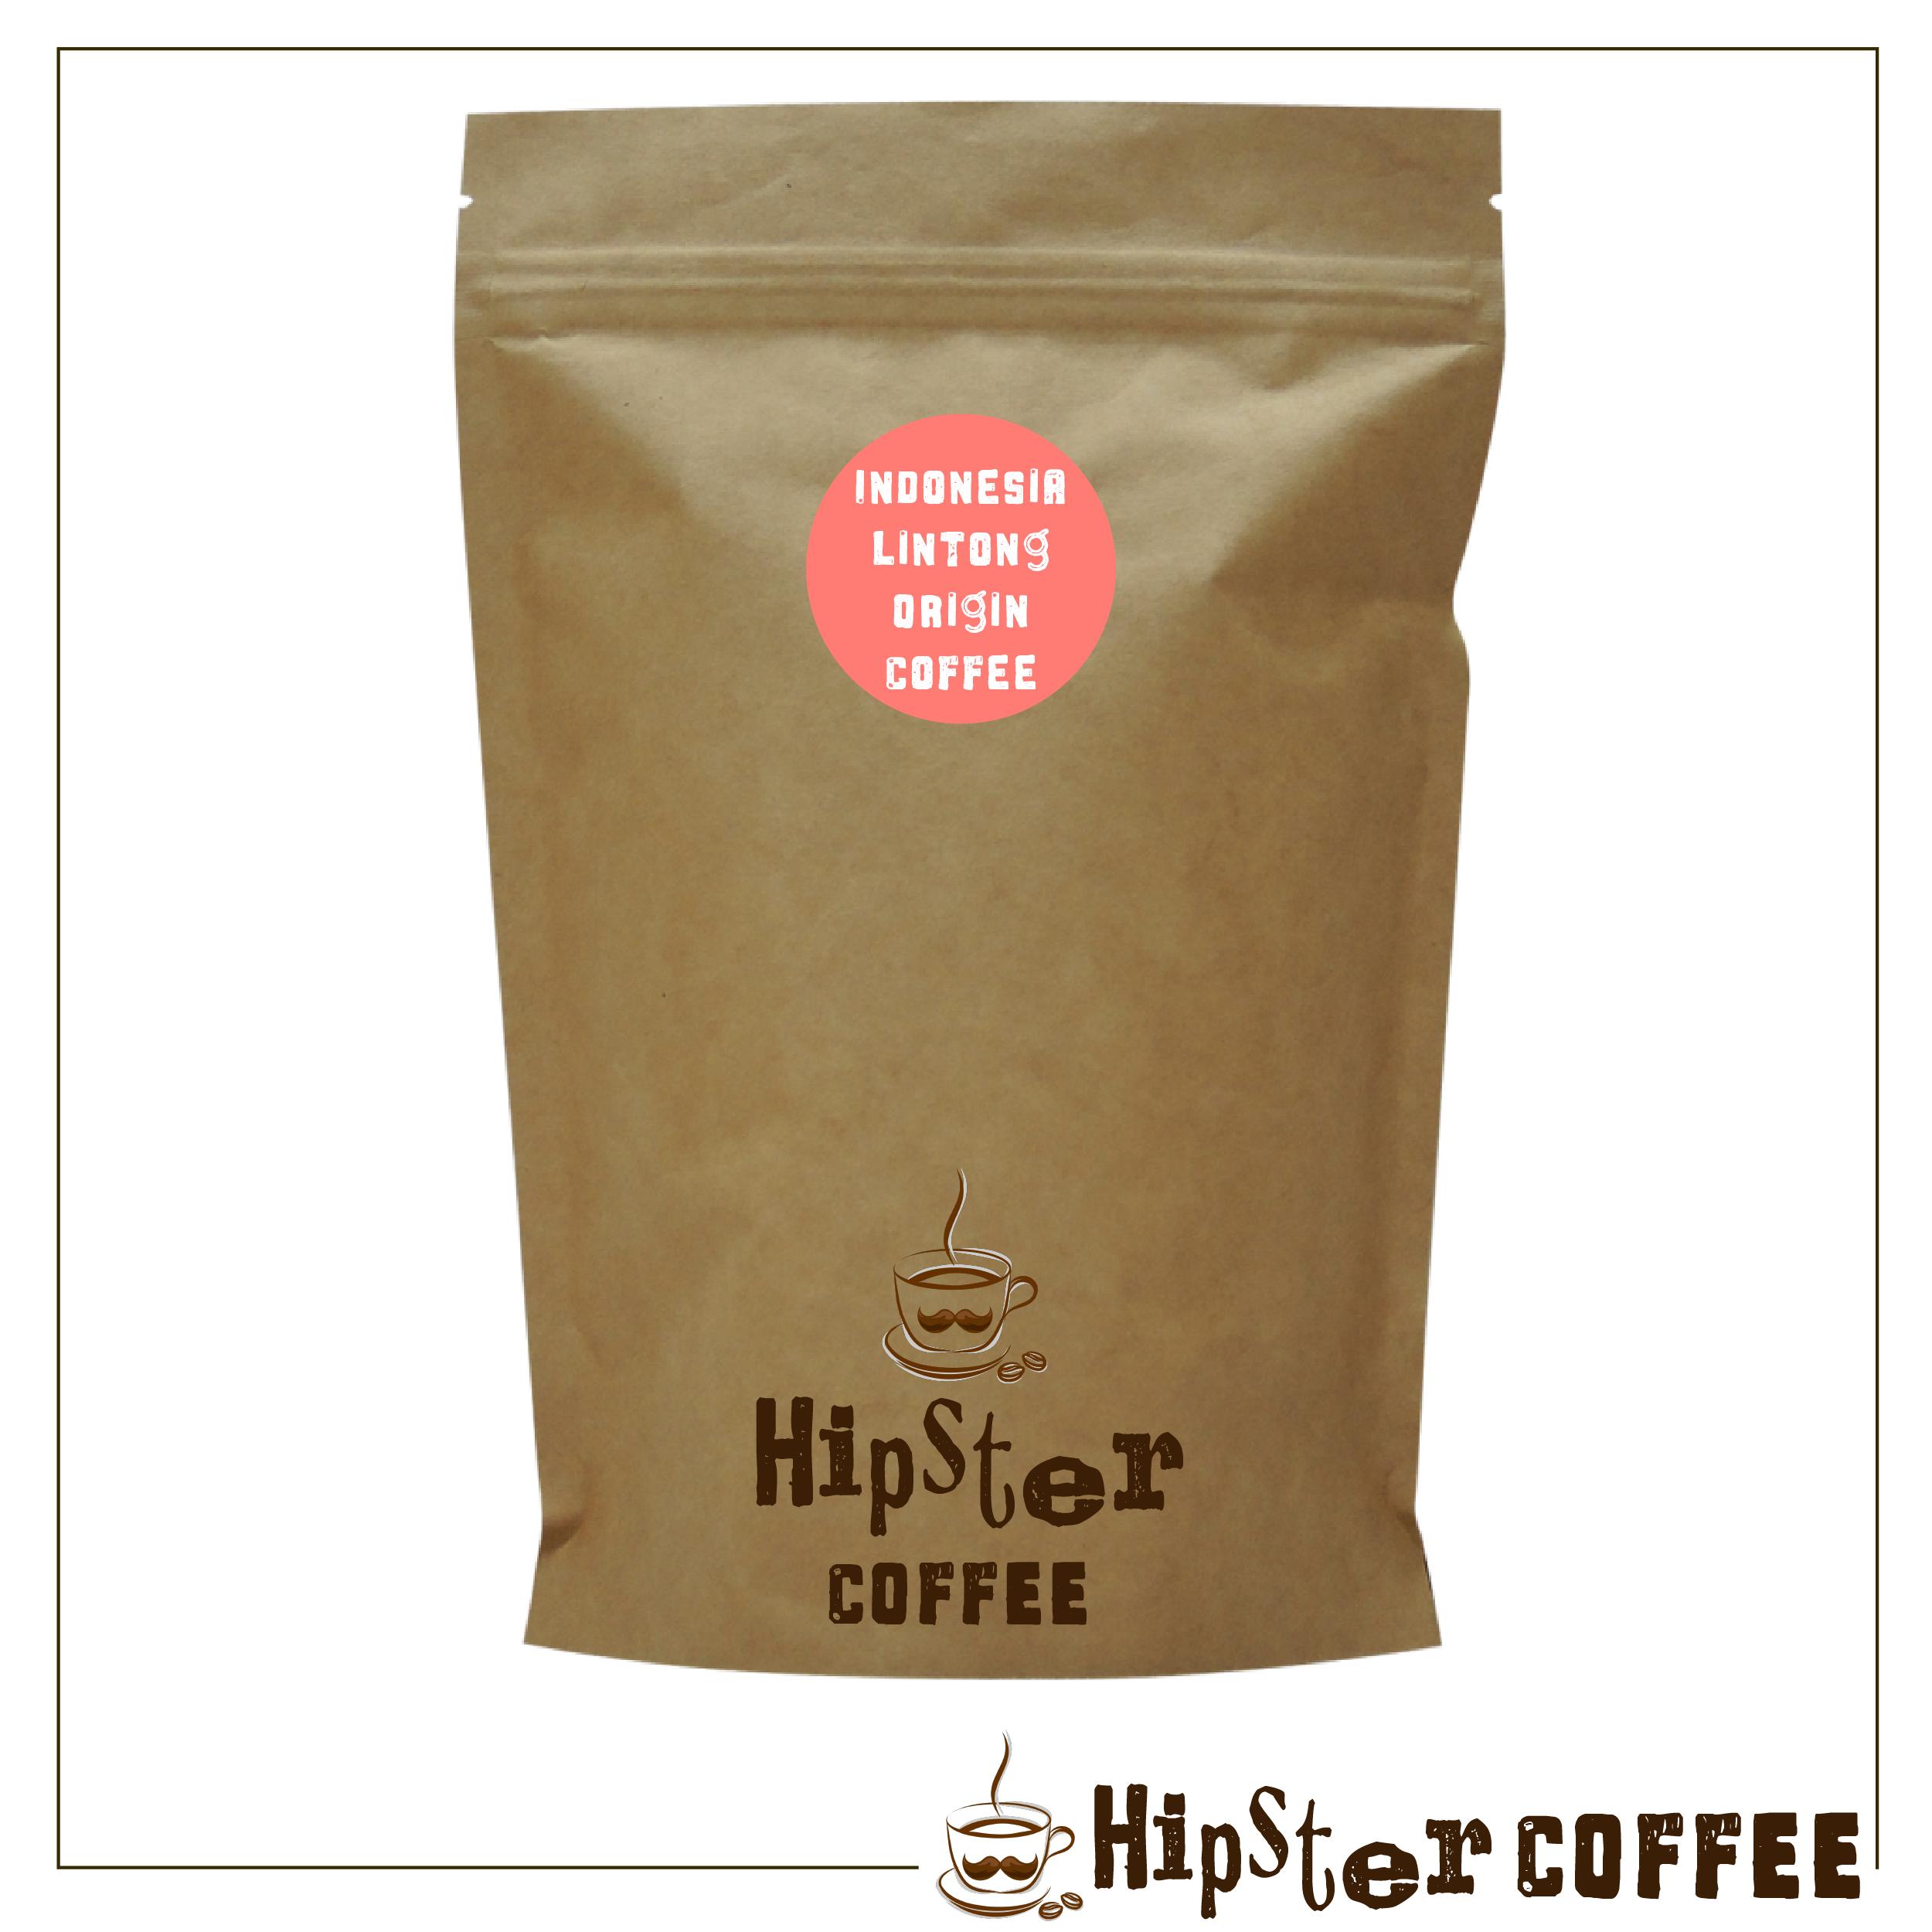 Indonesia Lintong Premium Origin Coffee A Unique Single